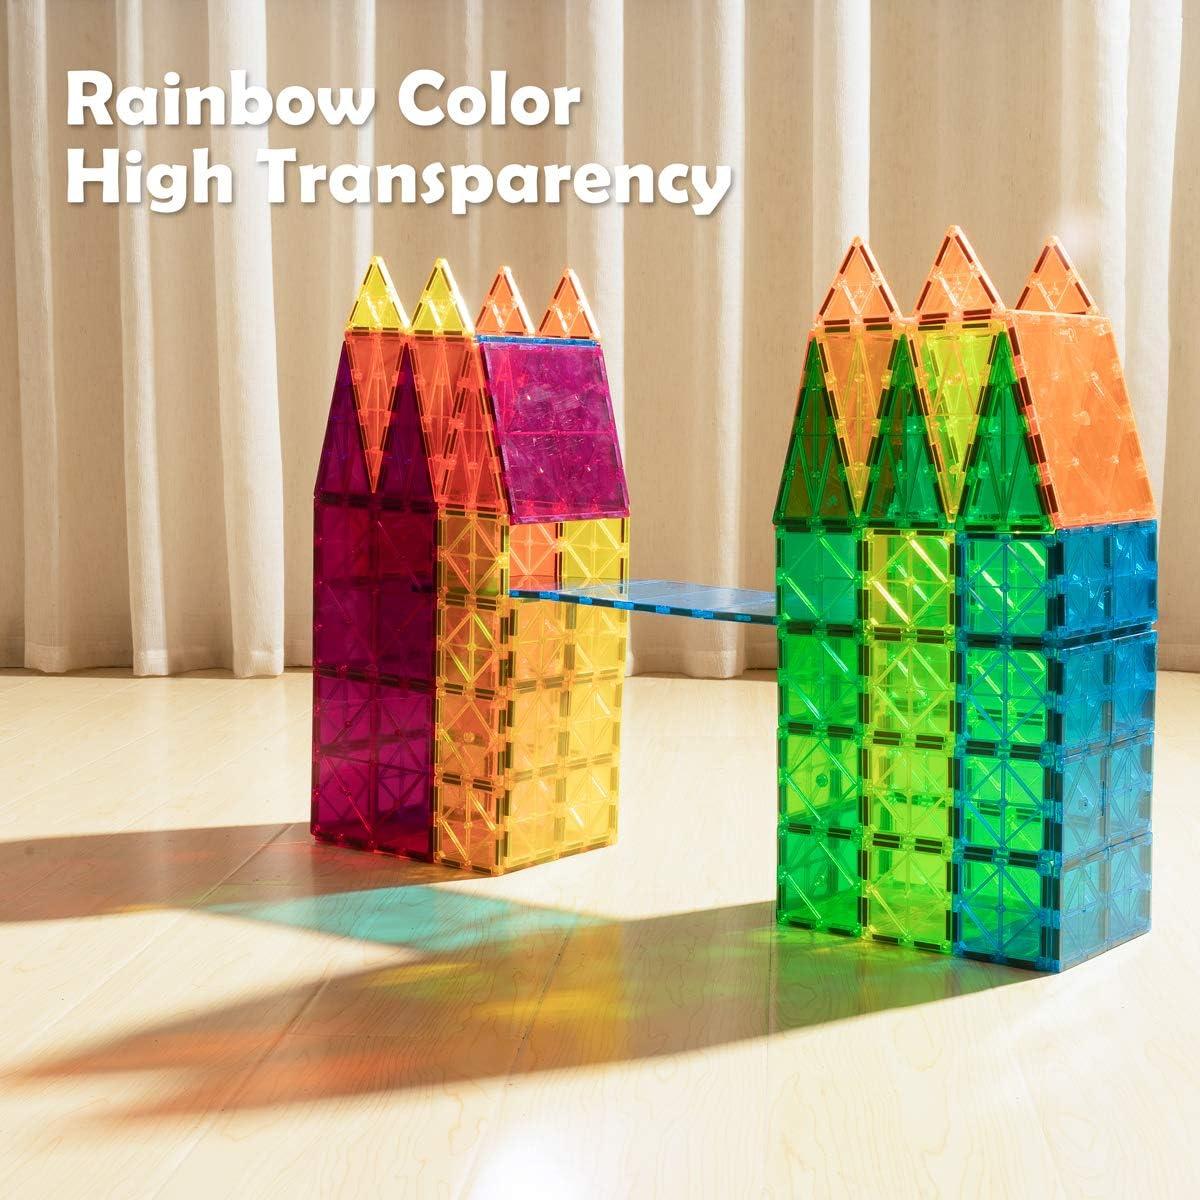 cossy Kids Magnet Toys Magnetic Tiles, 120 PCs Building Blocks,...